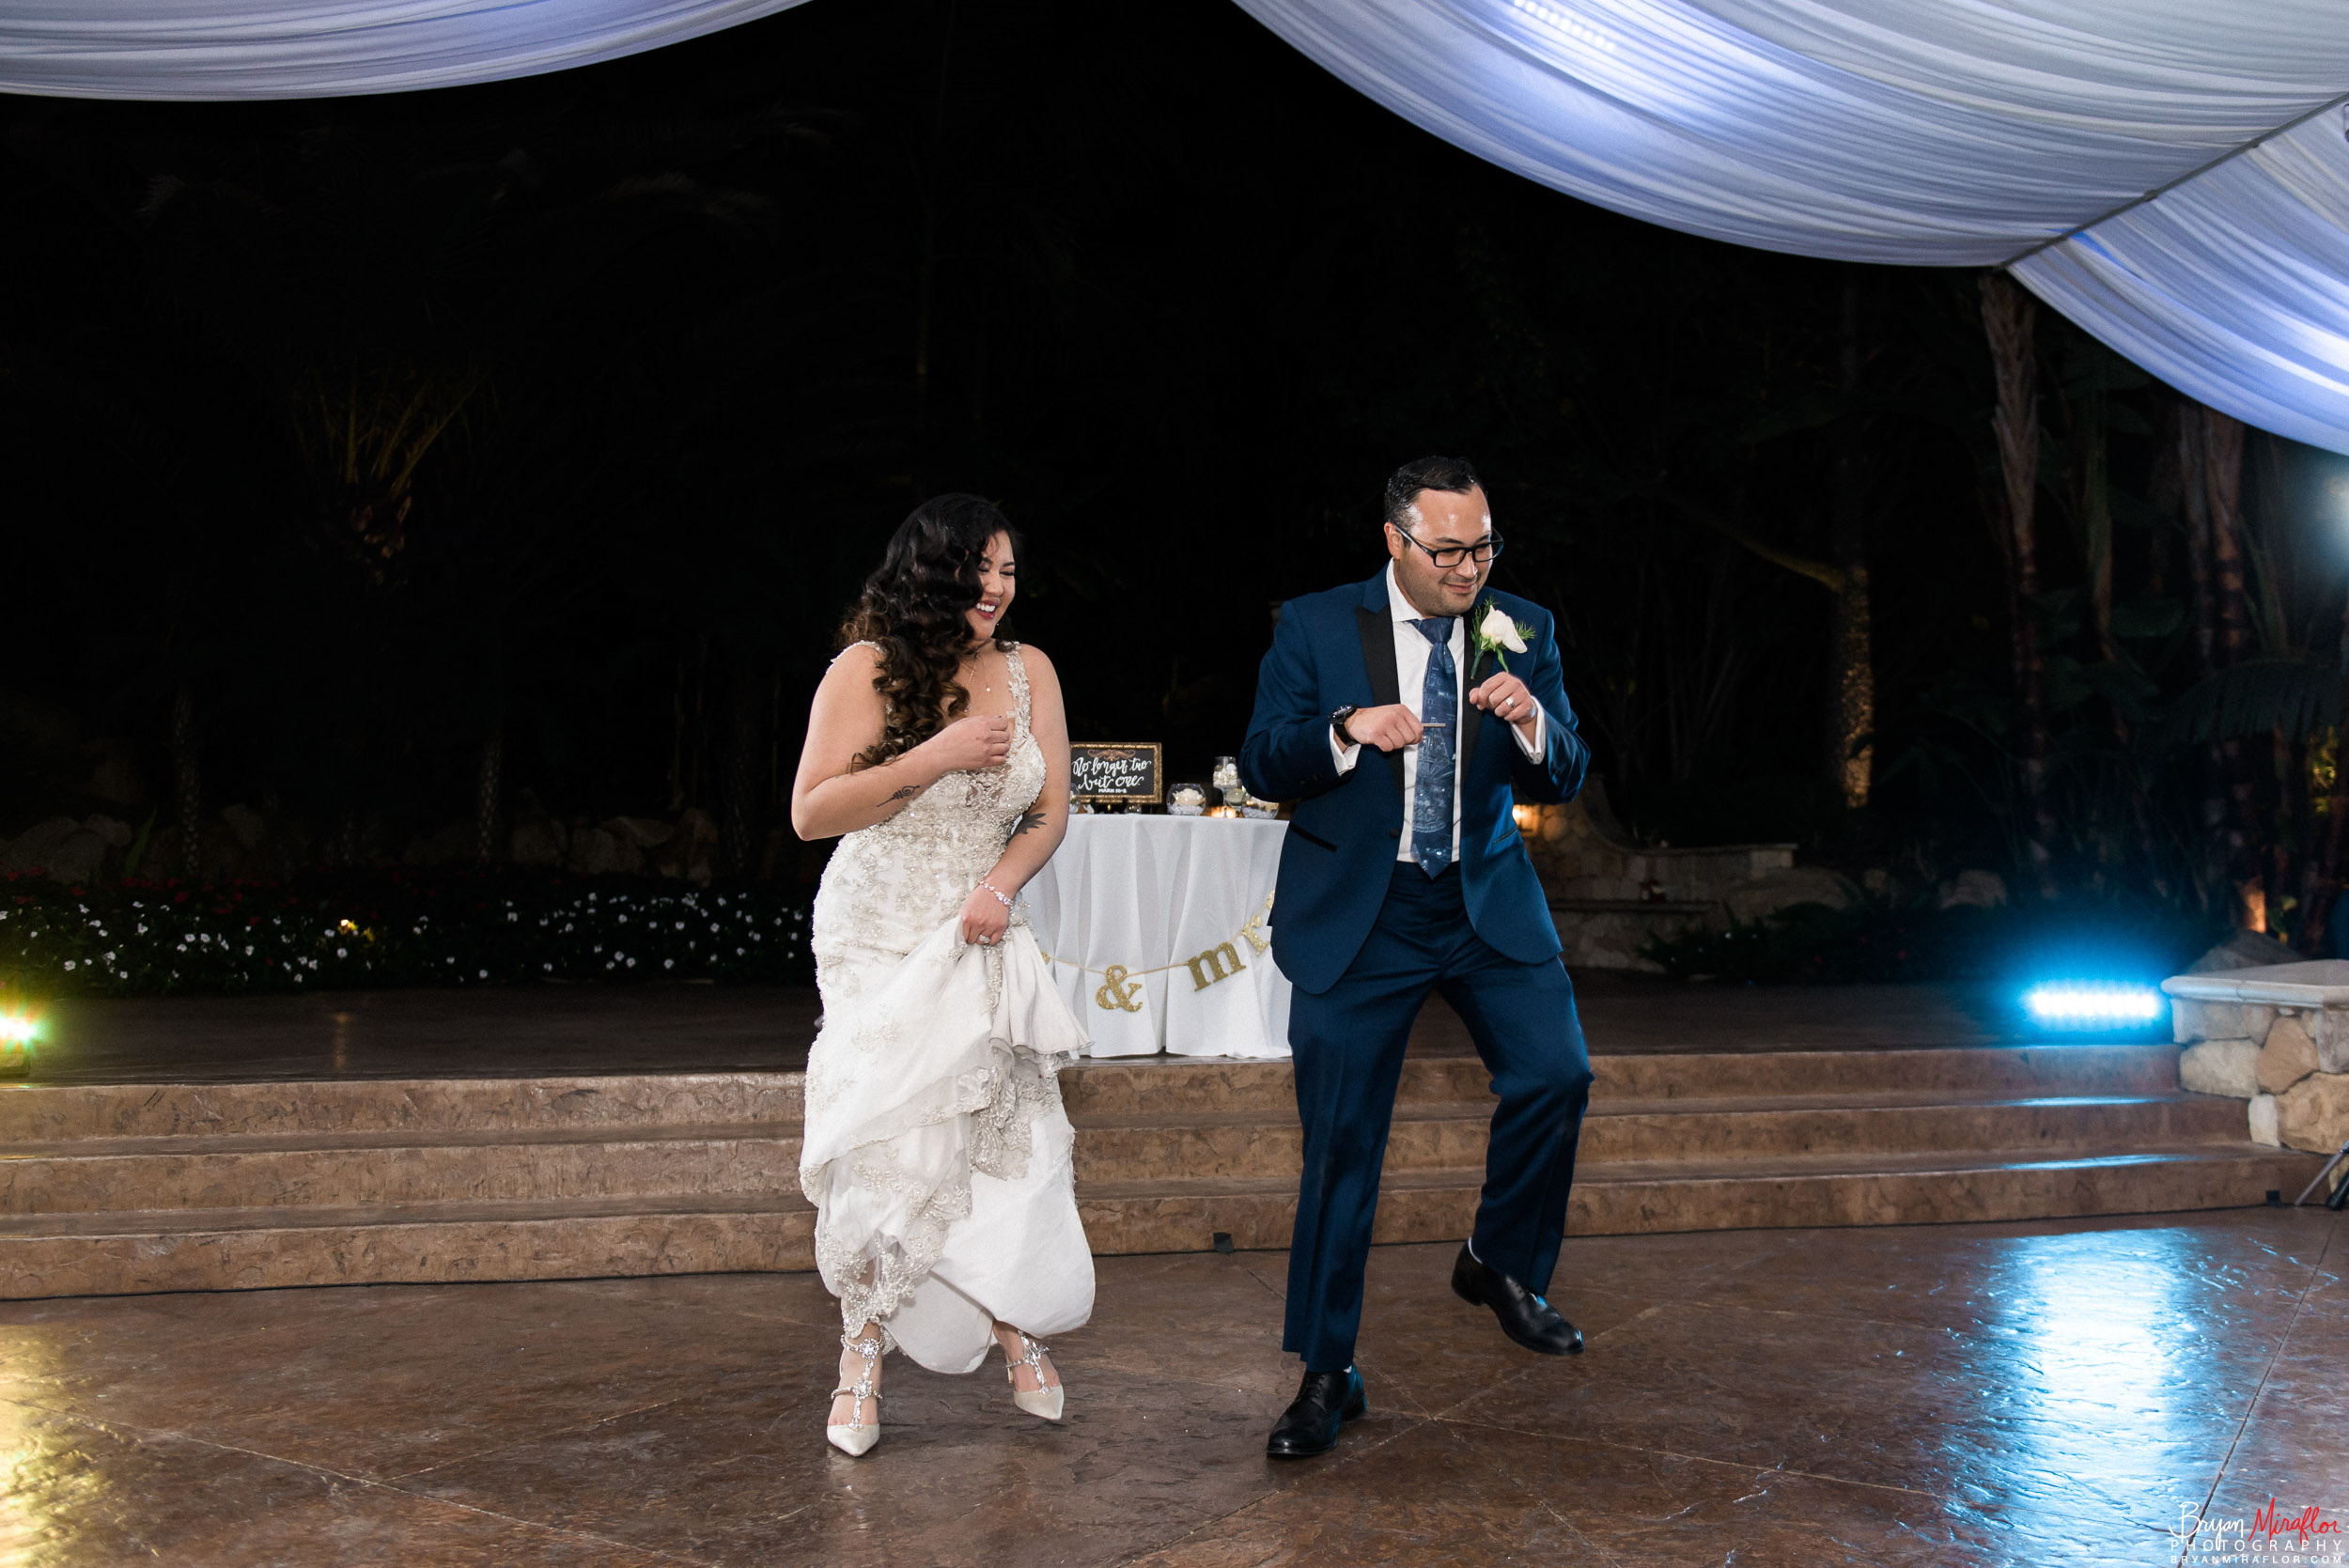 Bryan-Miraflor-Photography-Hannah-Jonathan-Married-Grand-Traditions-Estate-Gardens-Fallbrook-20171222-219.jpg